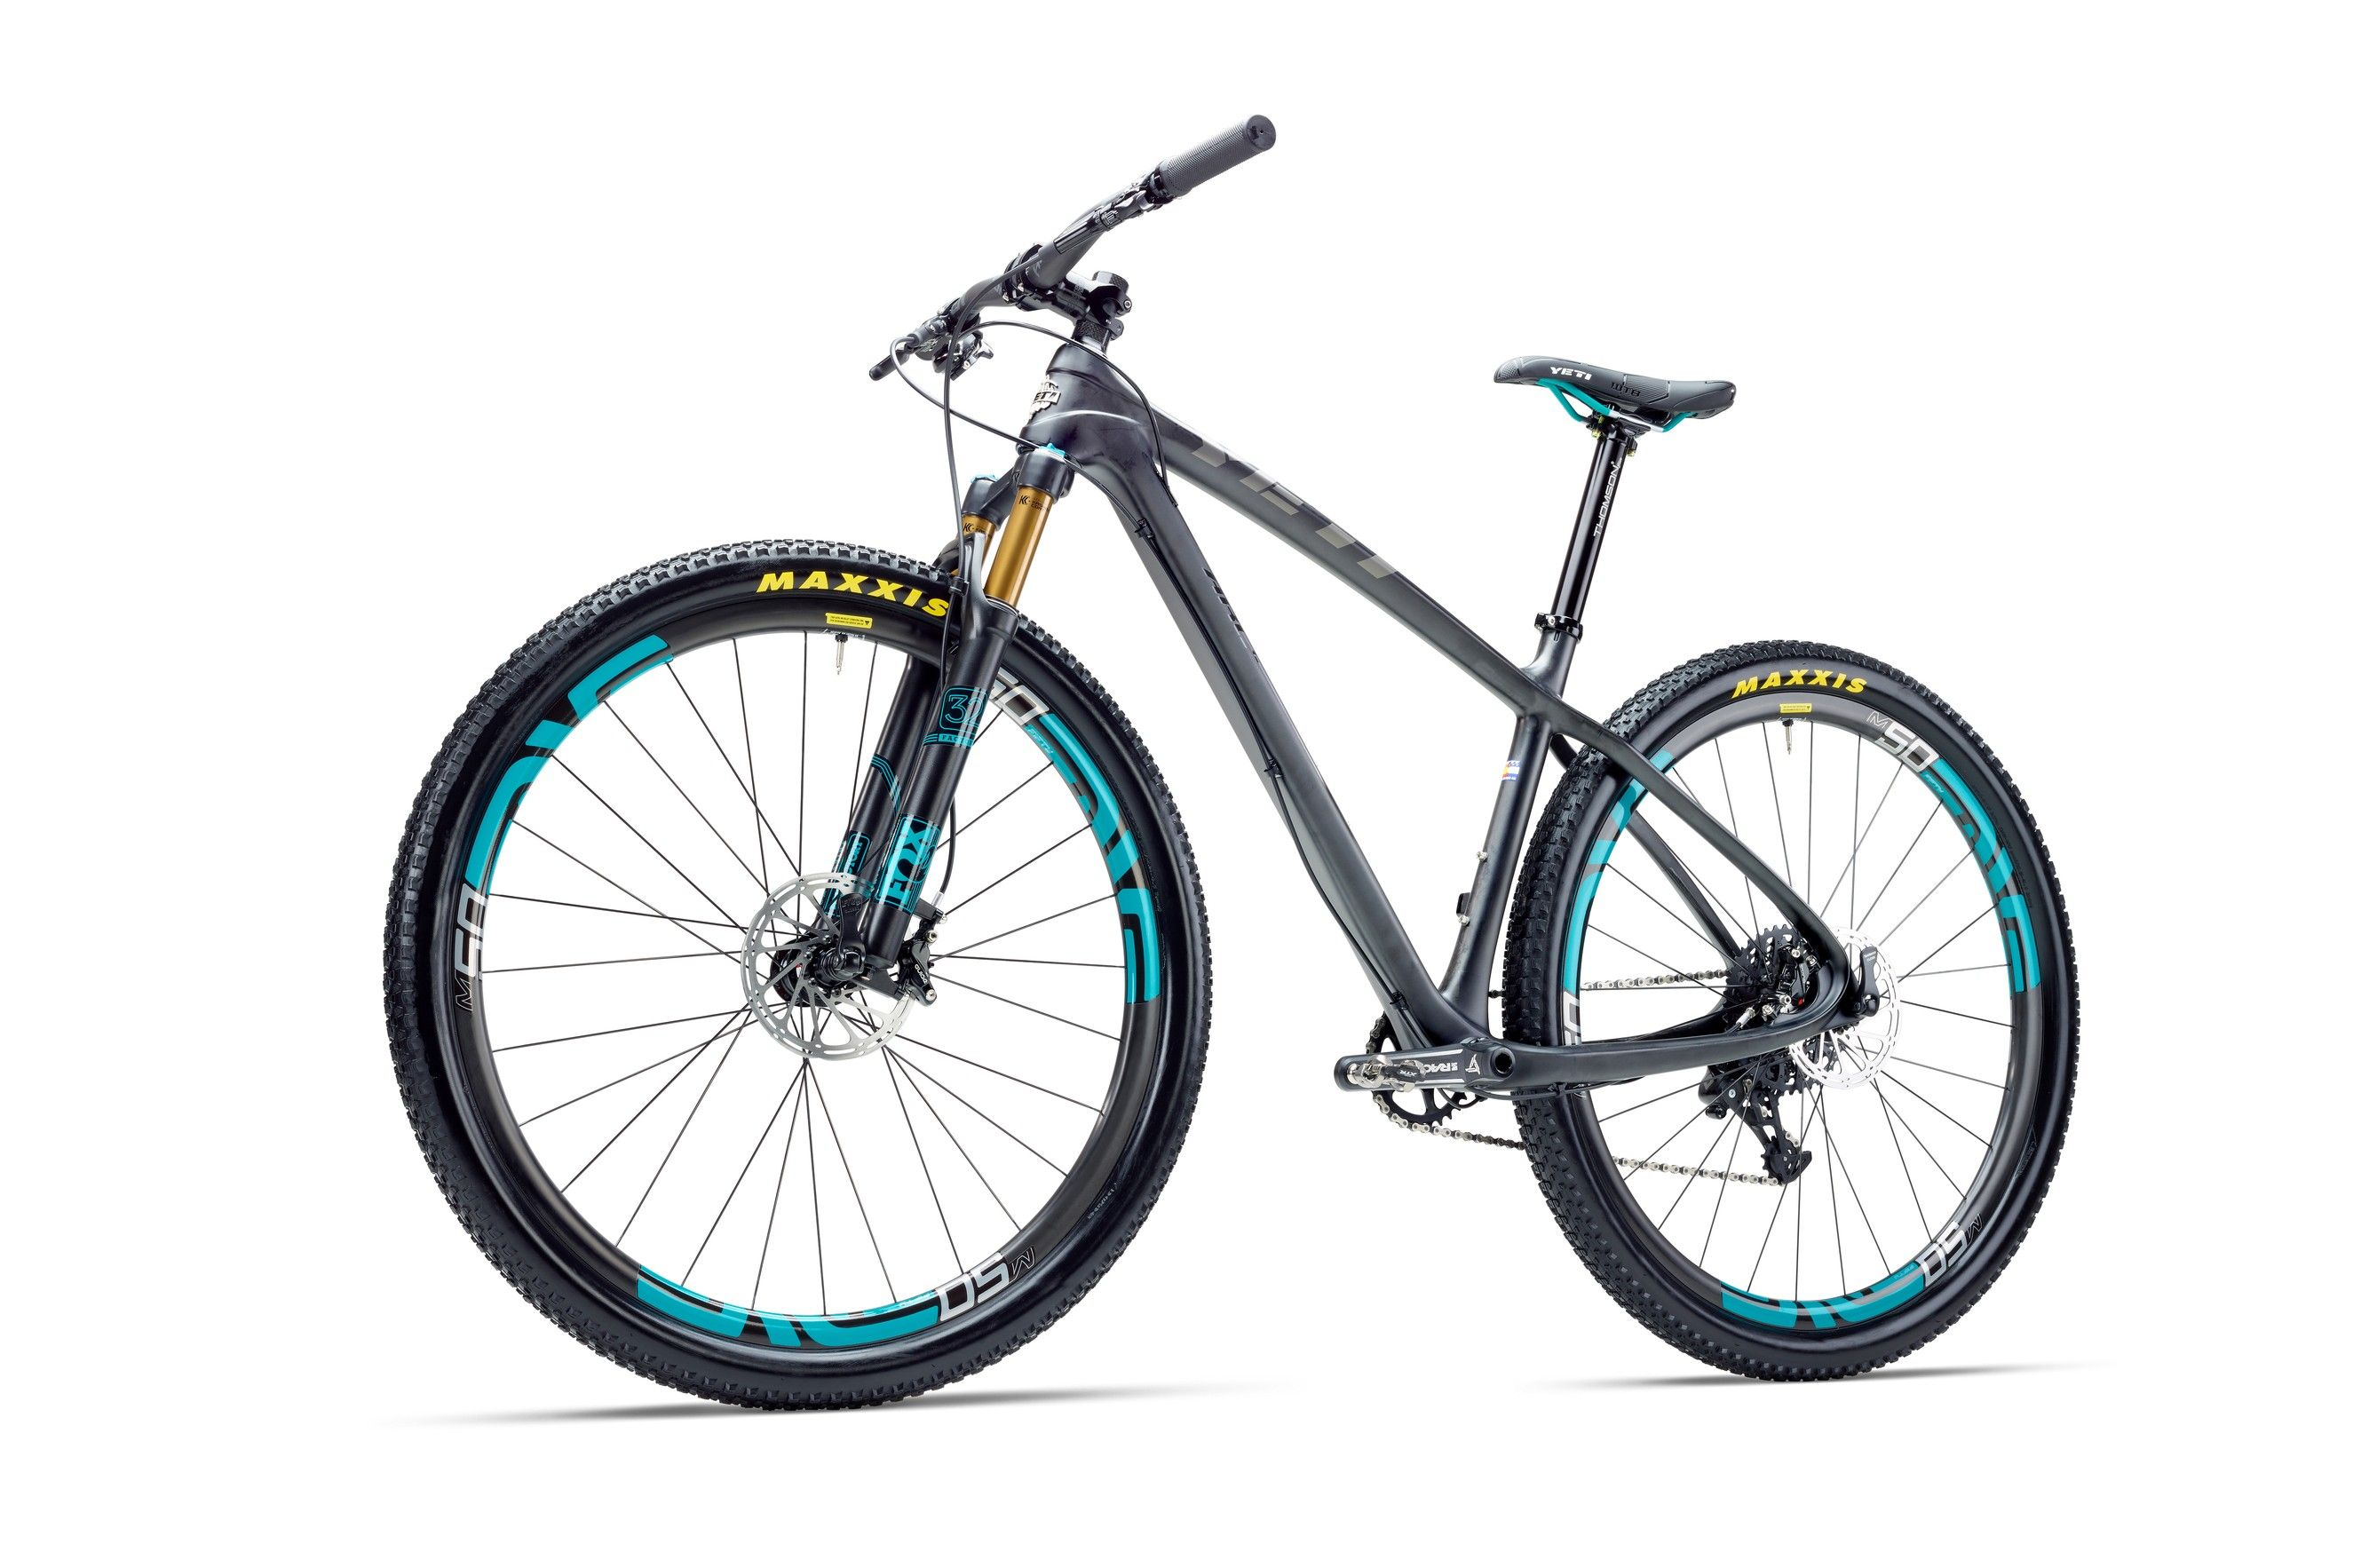 YETI ARC Carbon 29 Rahmenset Raw Grey 2016 - www.rider-store.de ...